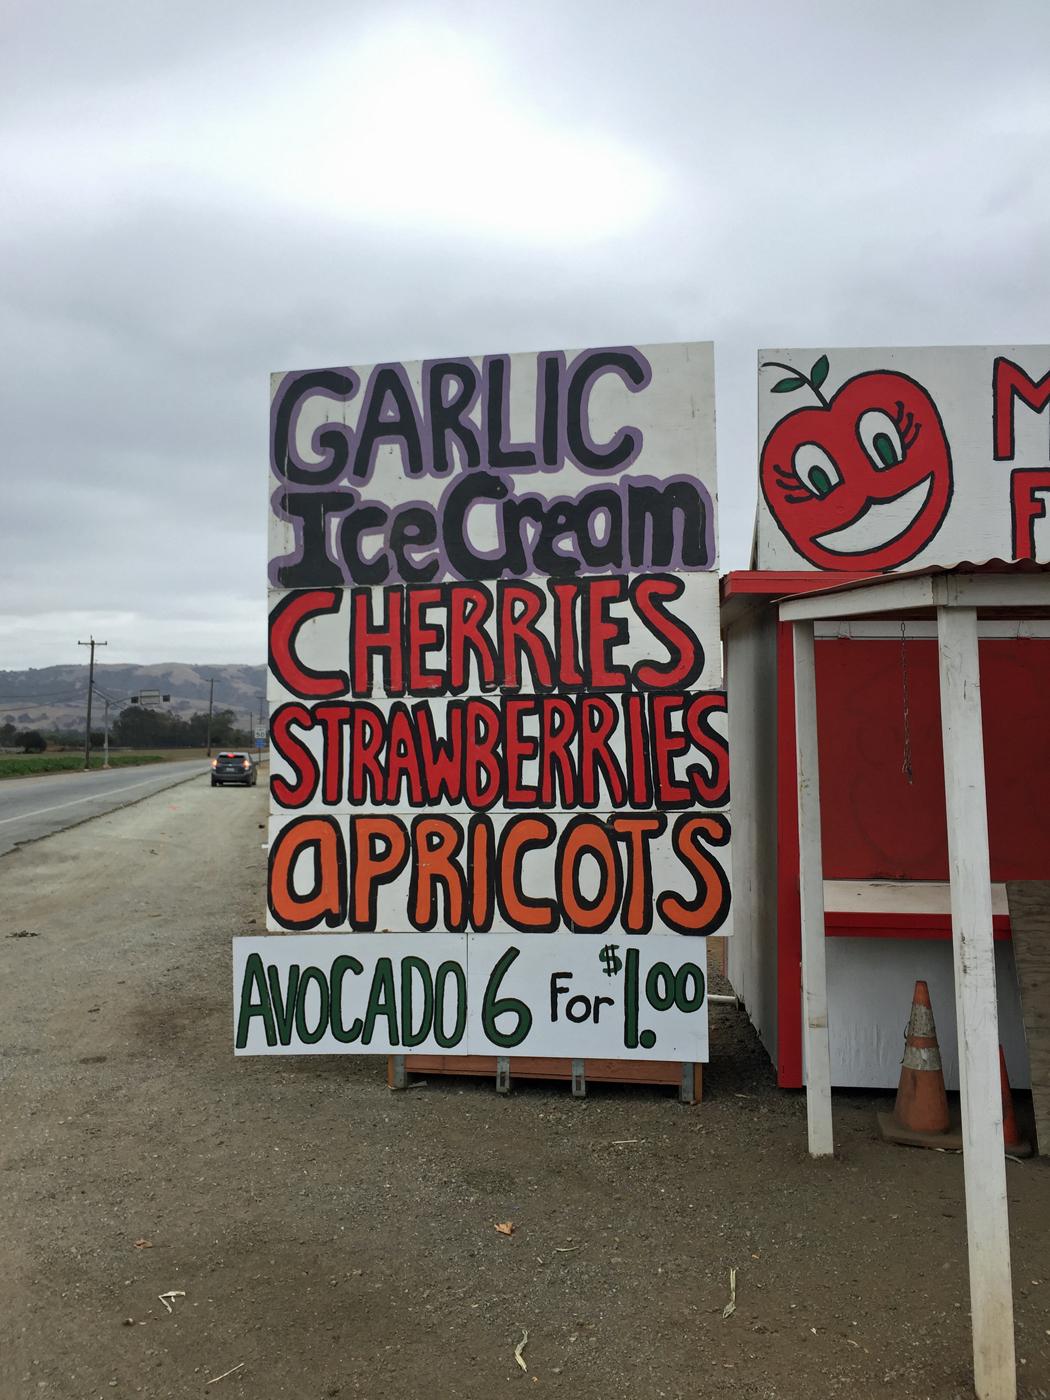 garlic-icecream